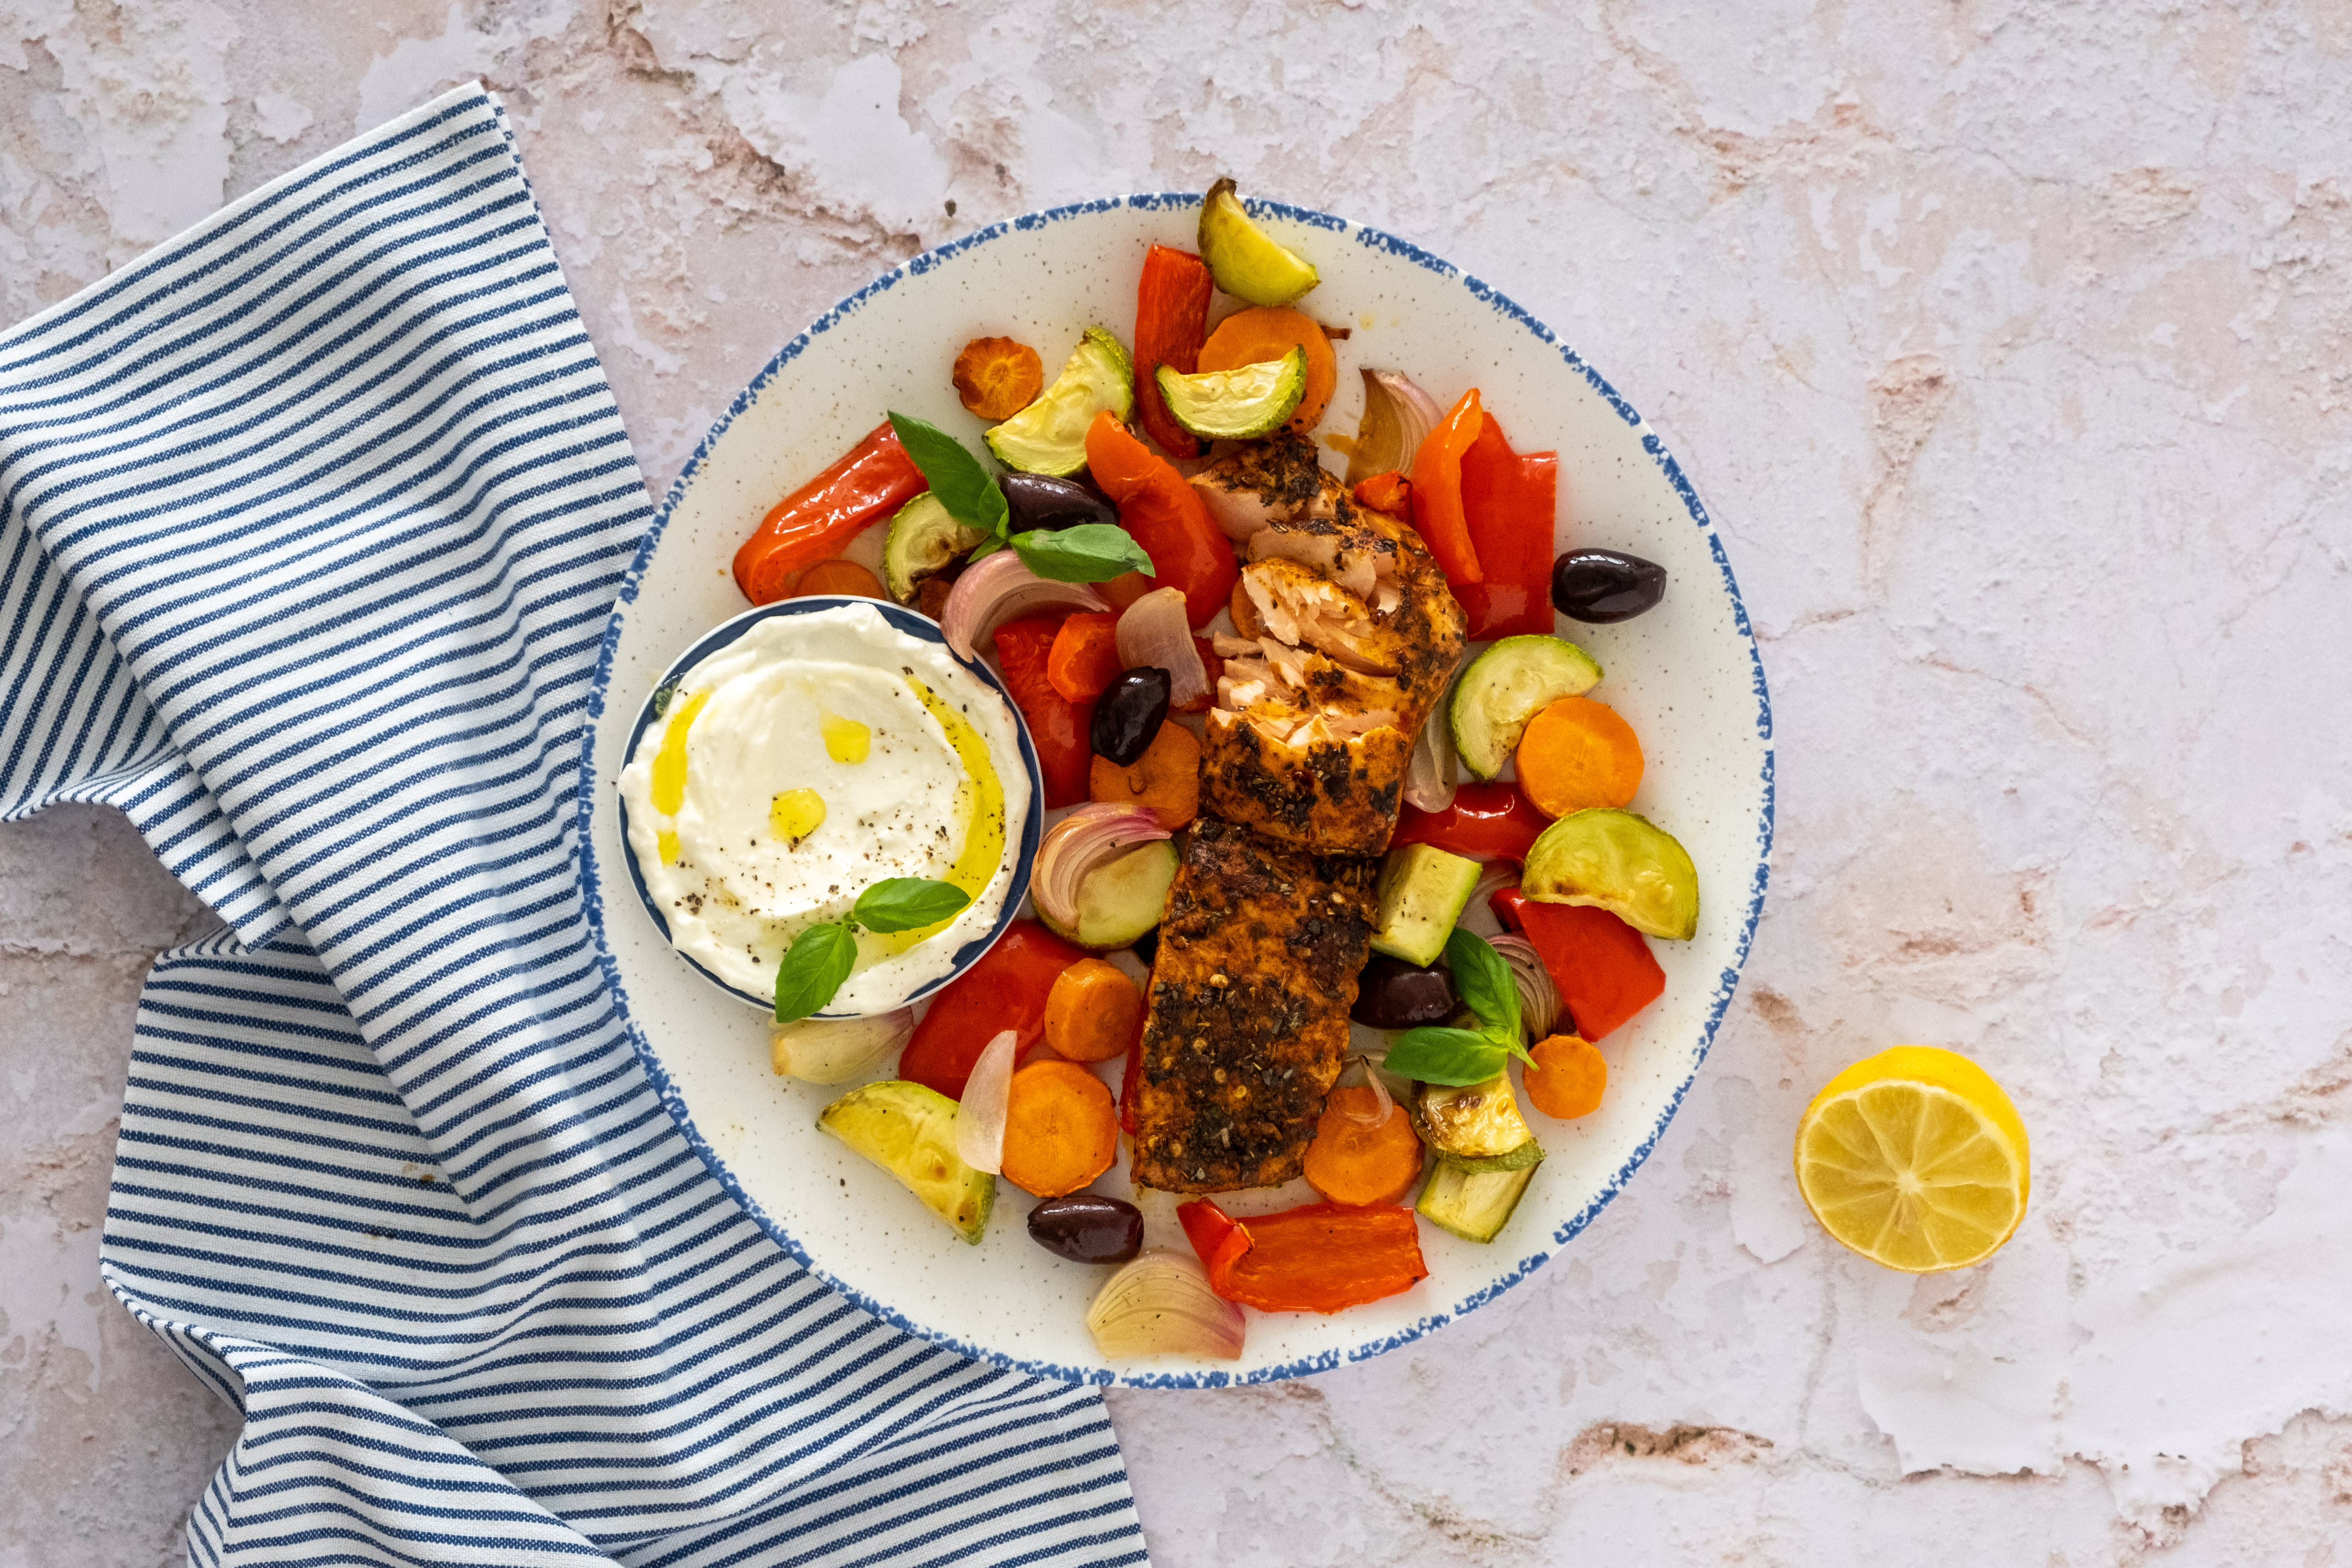 Greek Salmon with Roasted Vegetables and Lemon Feta